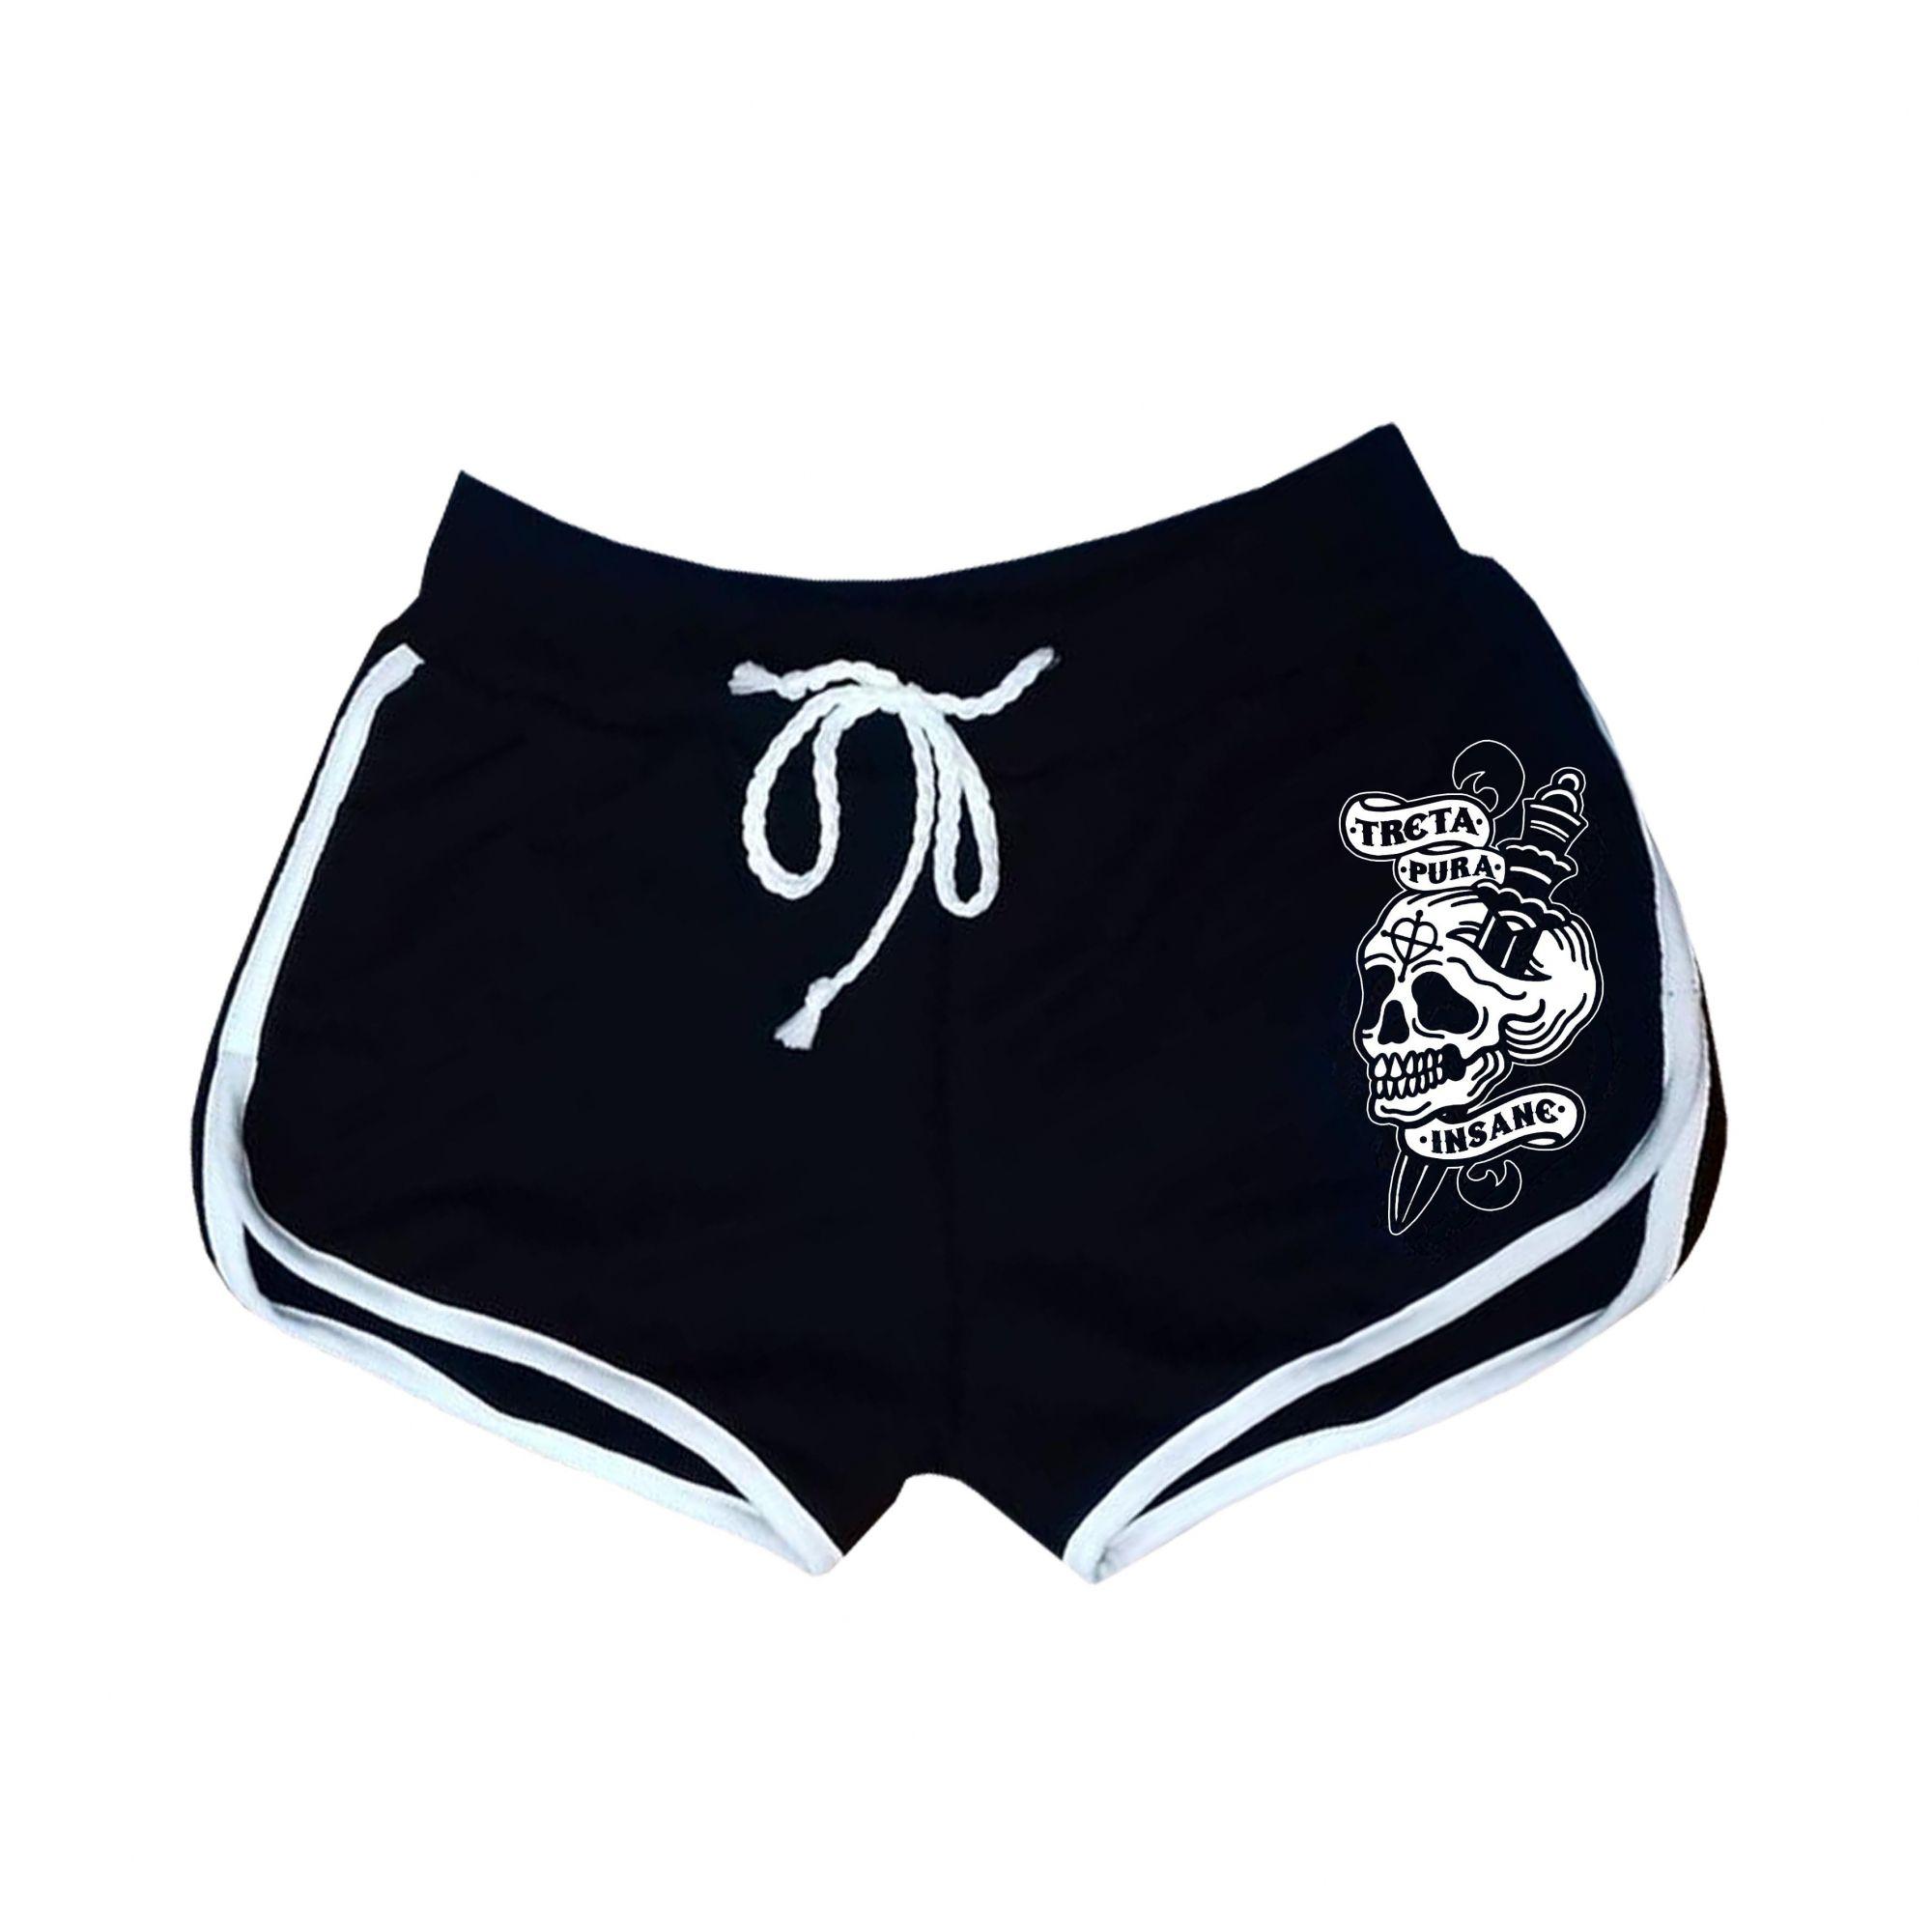 Shorts Treta Pura